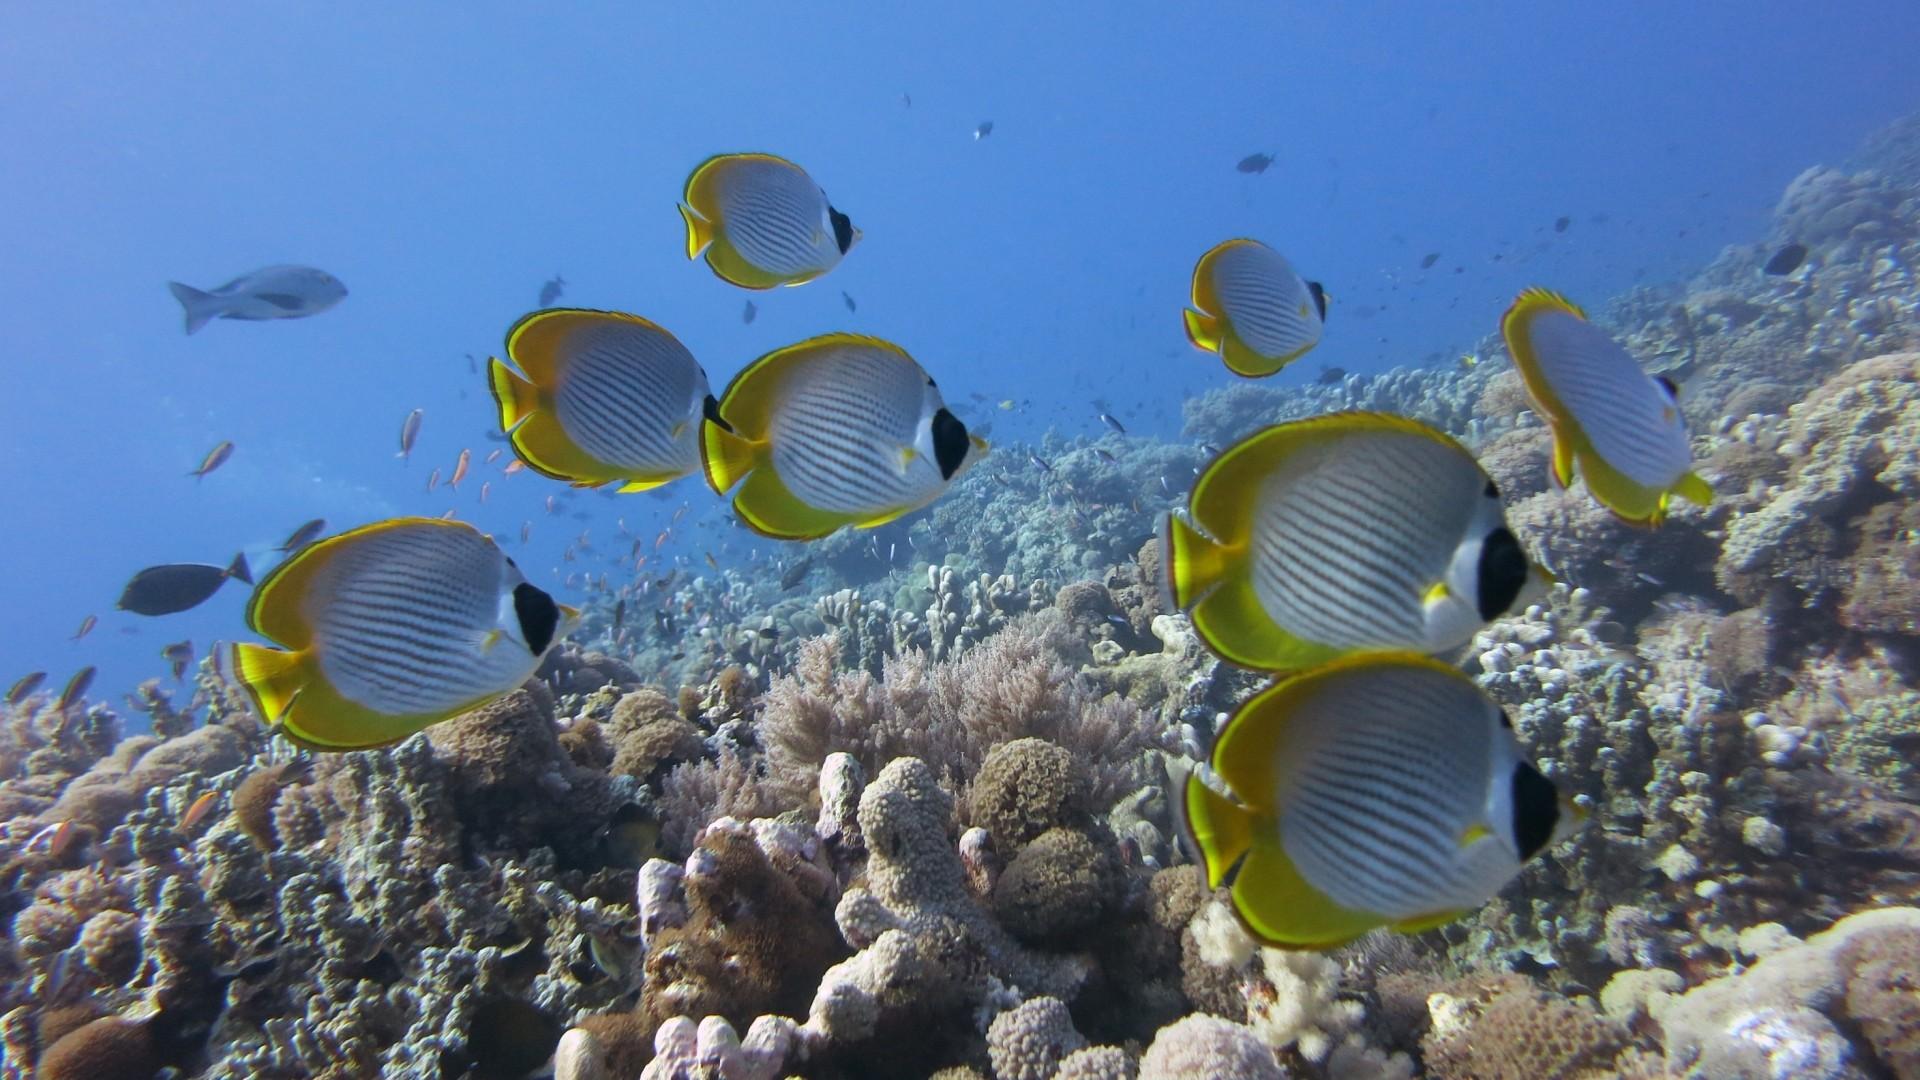 fish wallpaper and screensavers 58 images